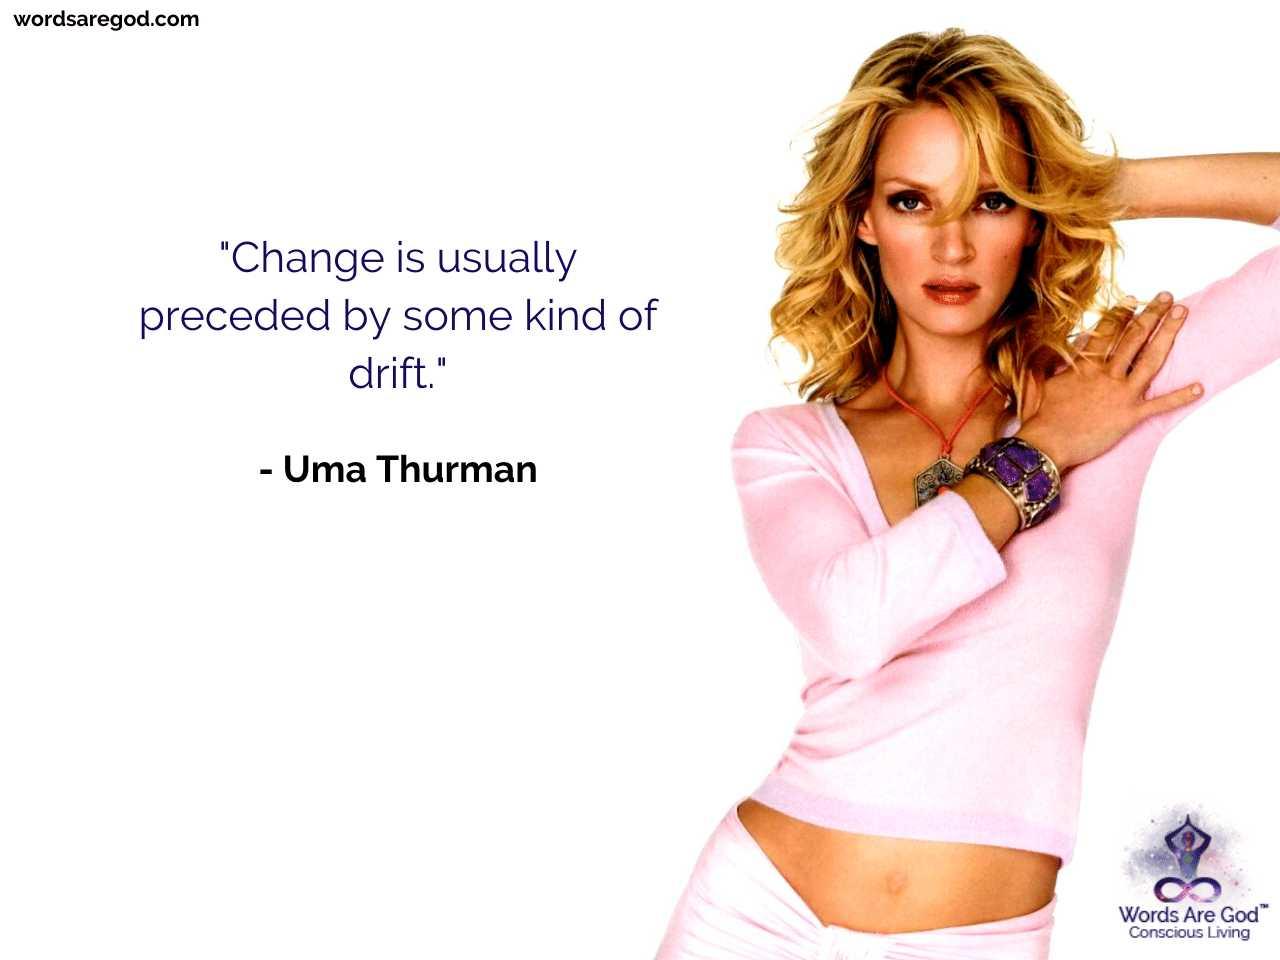 Uma Thurman Motivational Quote